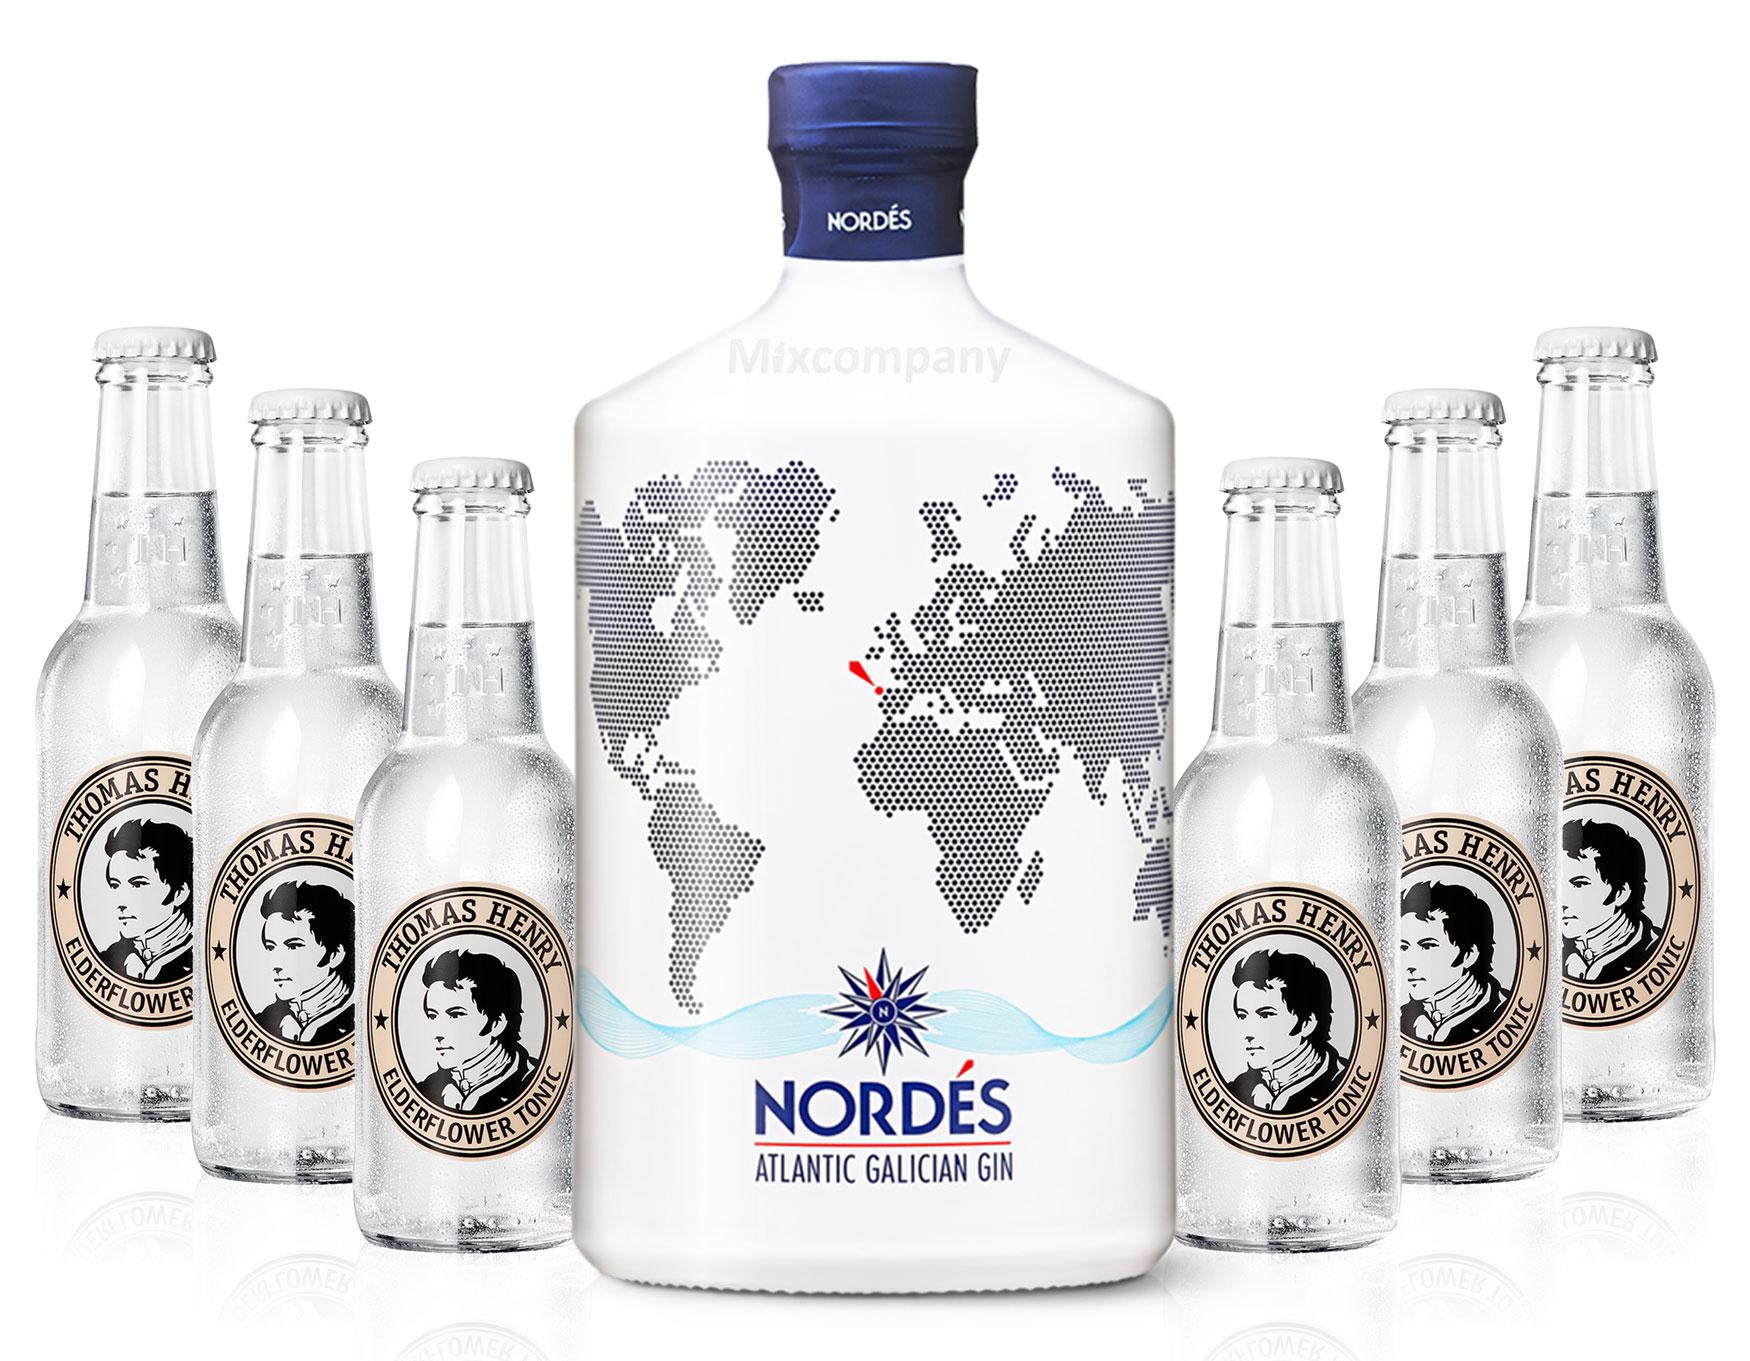 Nordes Atlantic Galician Gin aus Galizien 0,7l (40% Vol) + 6x Thomas Henry Elderflower Tonic Water 0,2l MEHRWEG inkl. Pfand- [Enthält Sulfite]